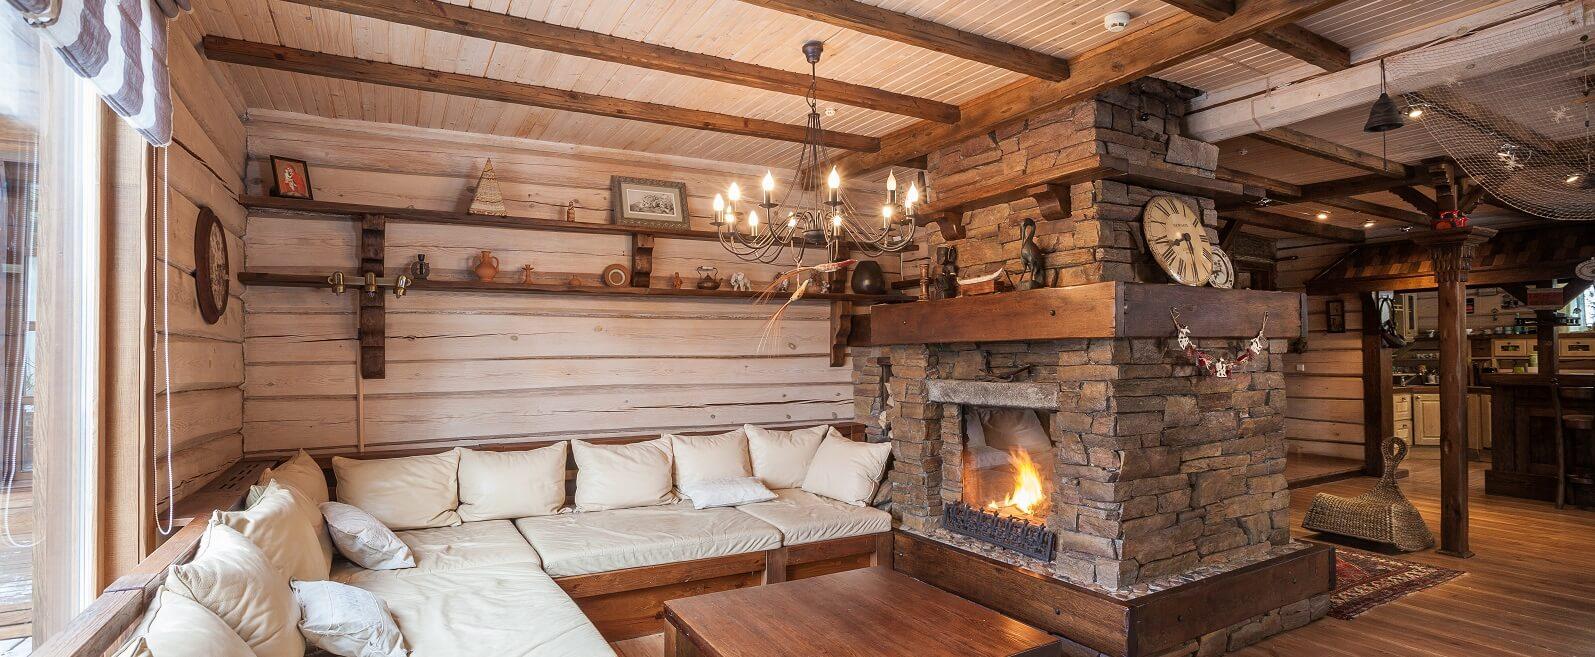 Luxury interior design in london interior architecture for Luxury residential interior designers london